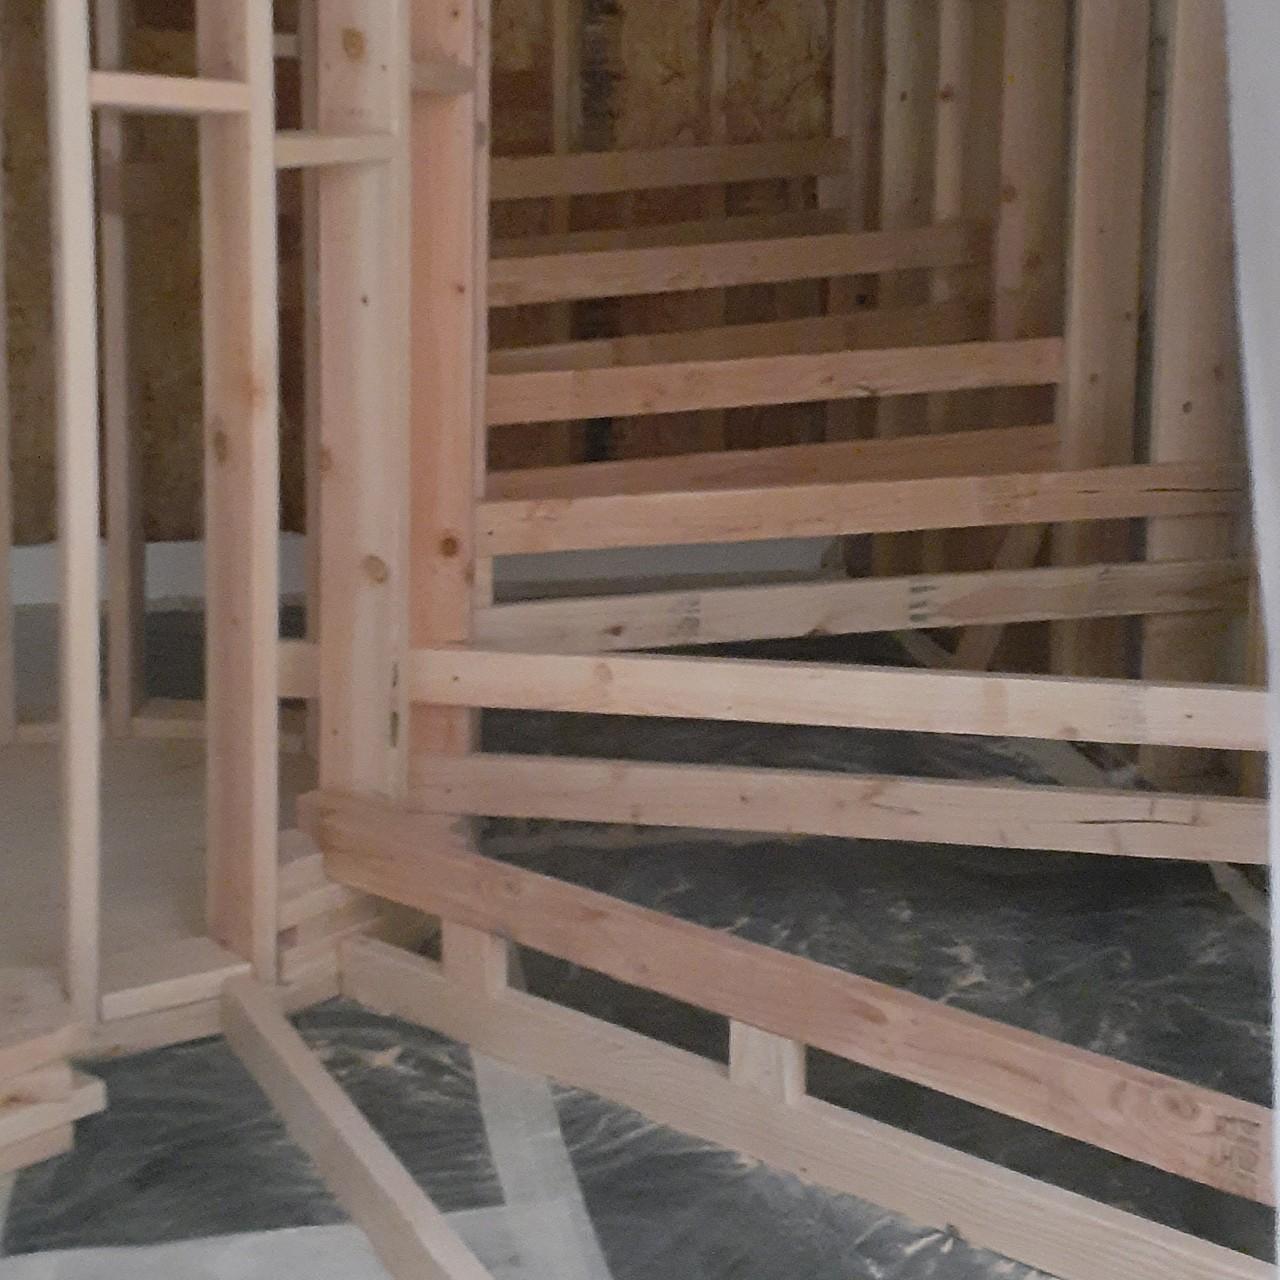 carpentry-wood-framing-second-floor-home-addition--framing-05